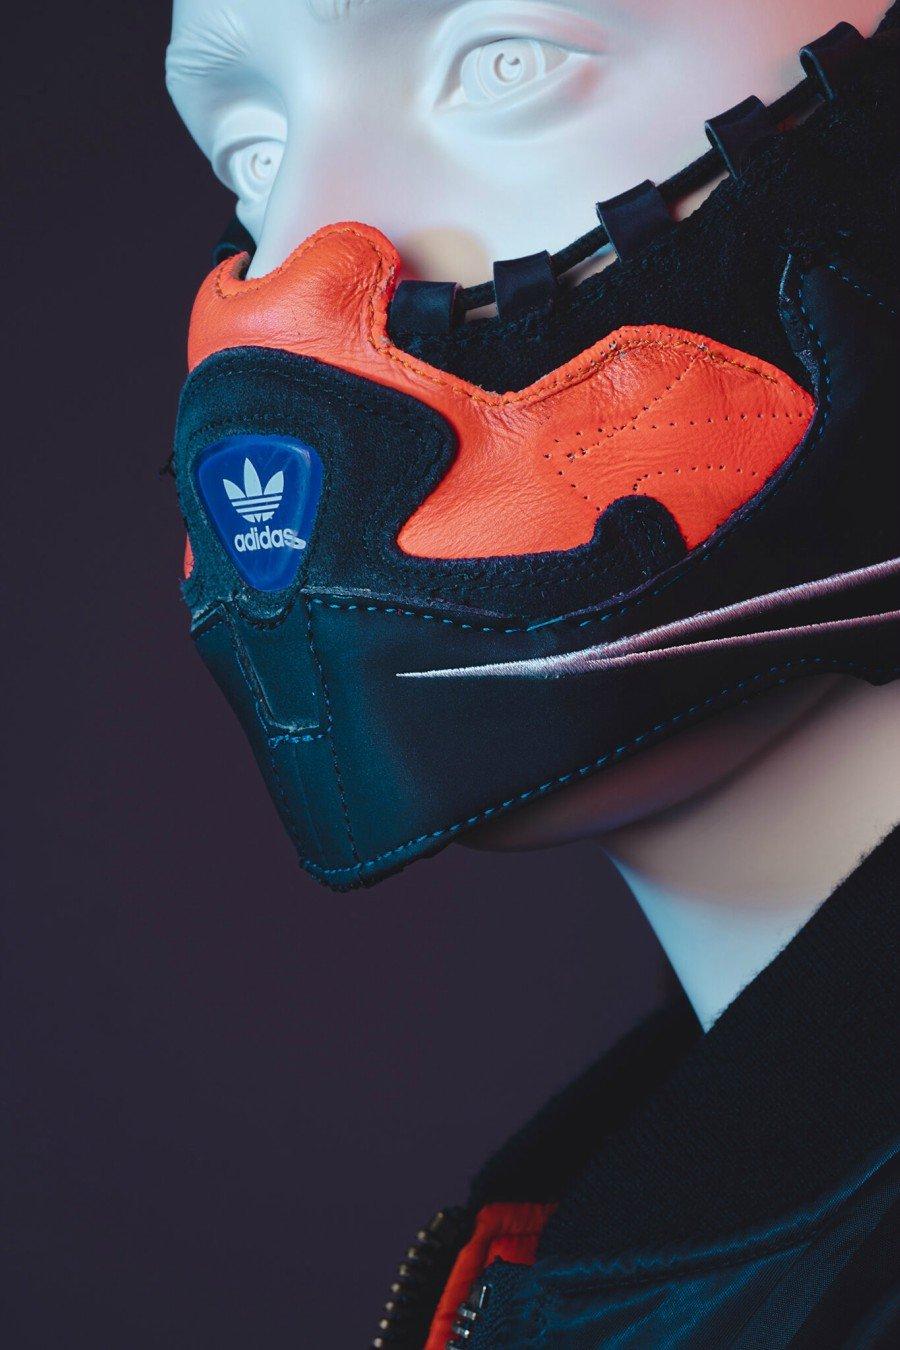 cubrebocas con sneakers